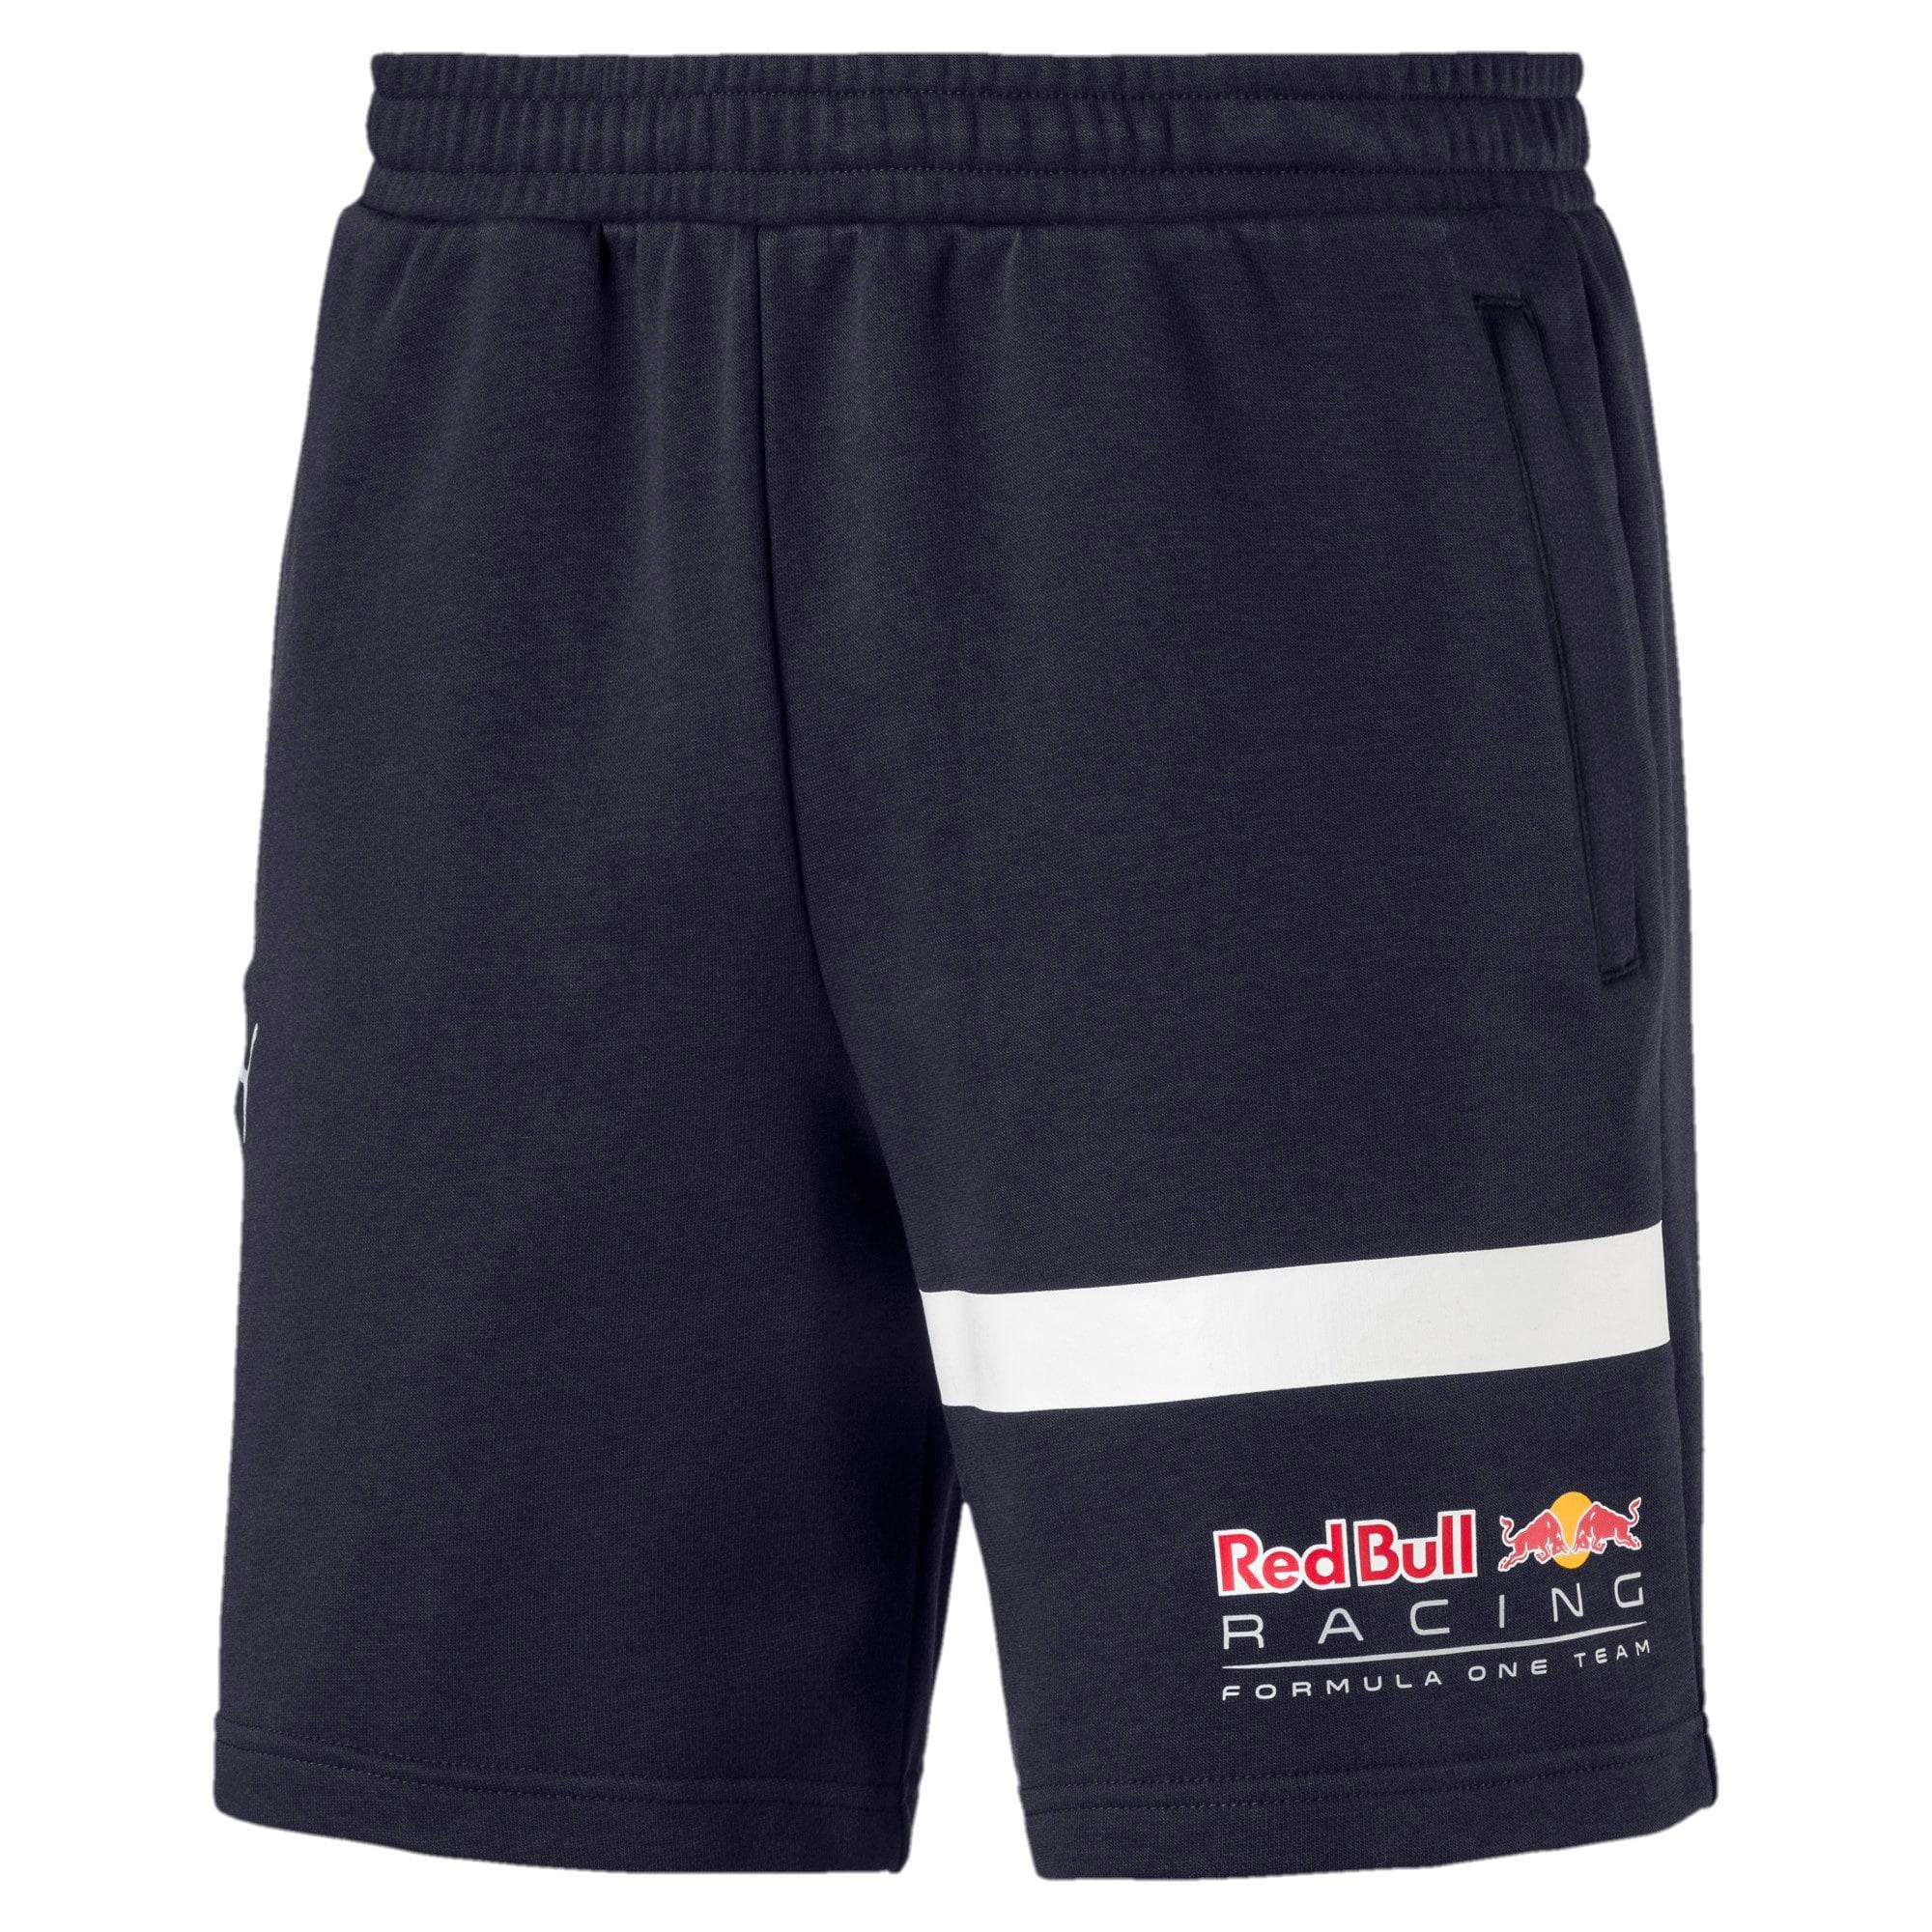 Thumbnail 3 of Red Bull Racing Logo Men's Sweat Shorts, NIGHT SKY, medium-IND